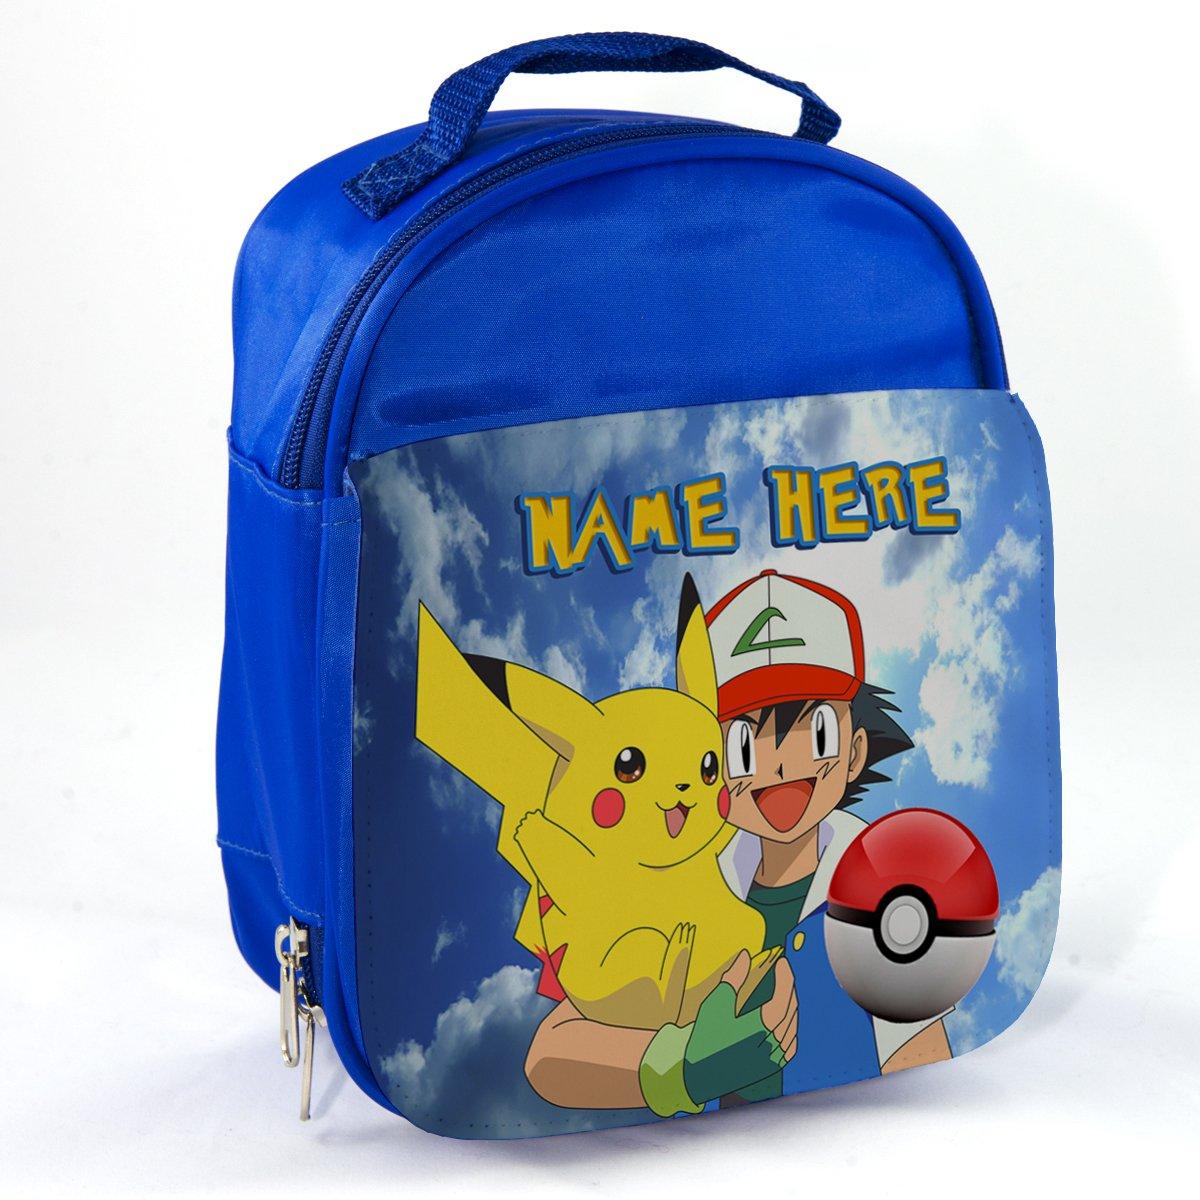 Personalised Pokemon Pk01 Blue Childrens Insulated School Lunch Box Cooler Bag KRAFTYGIFTS KGPL206